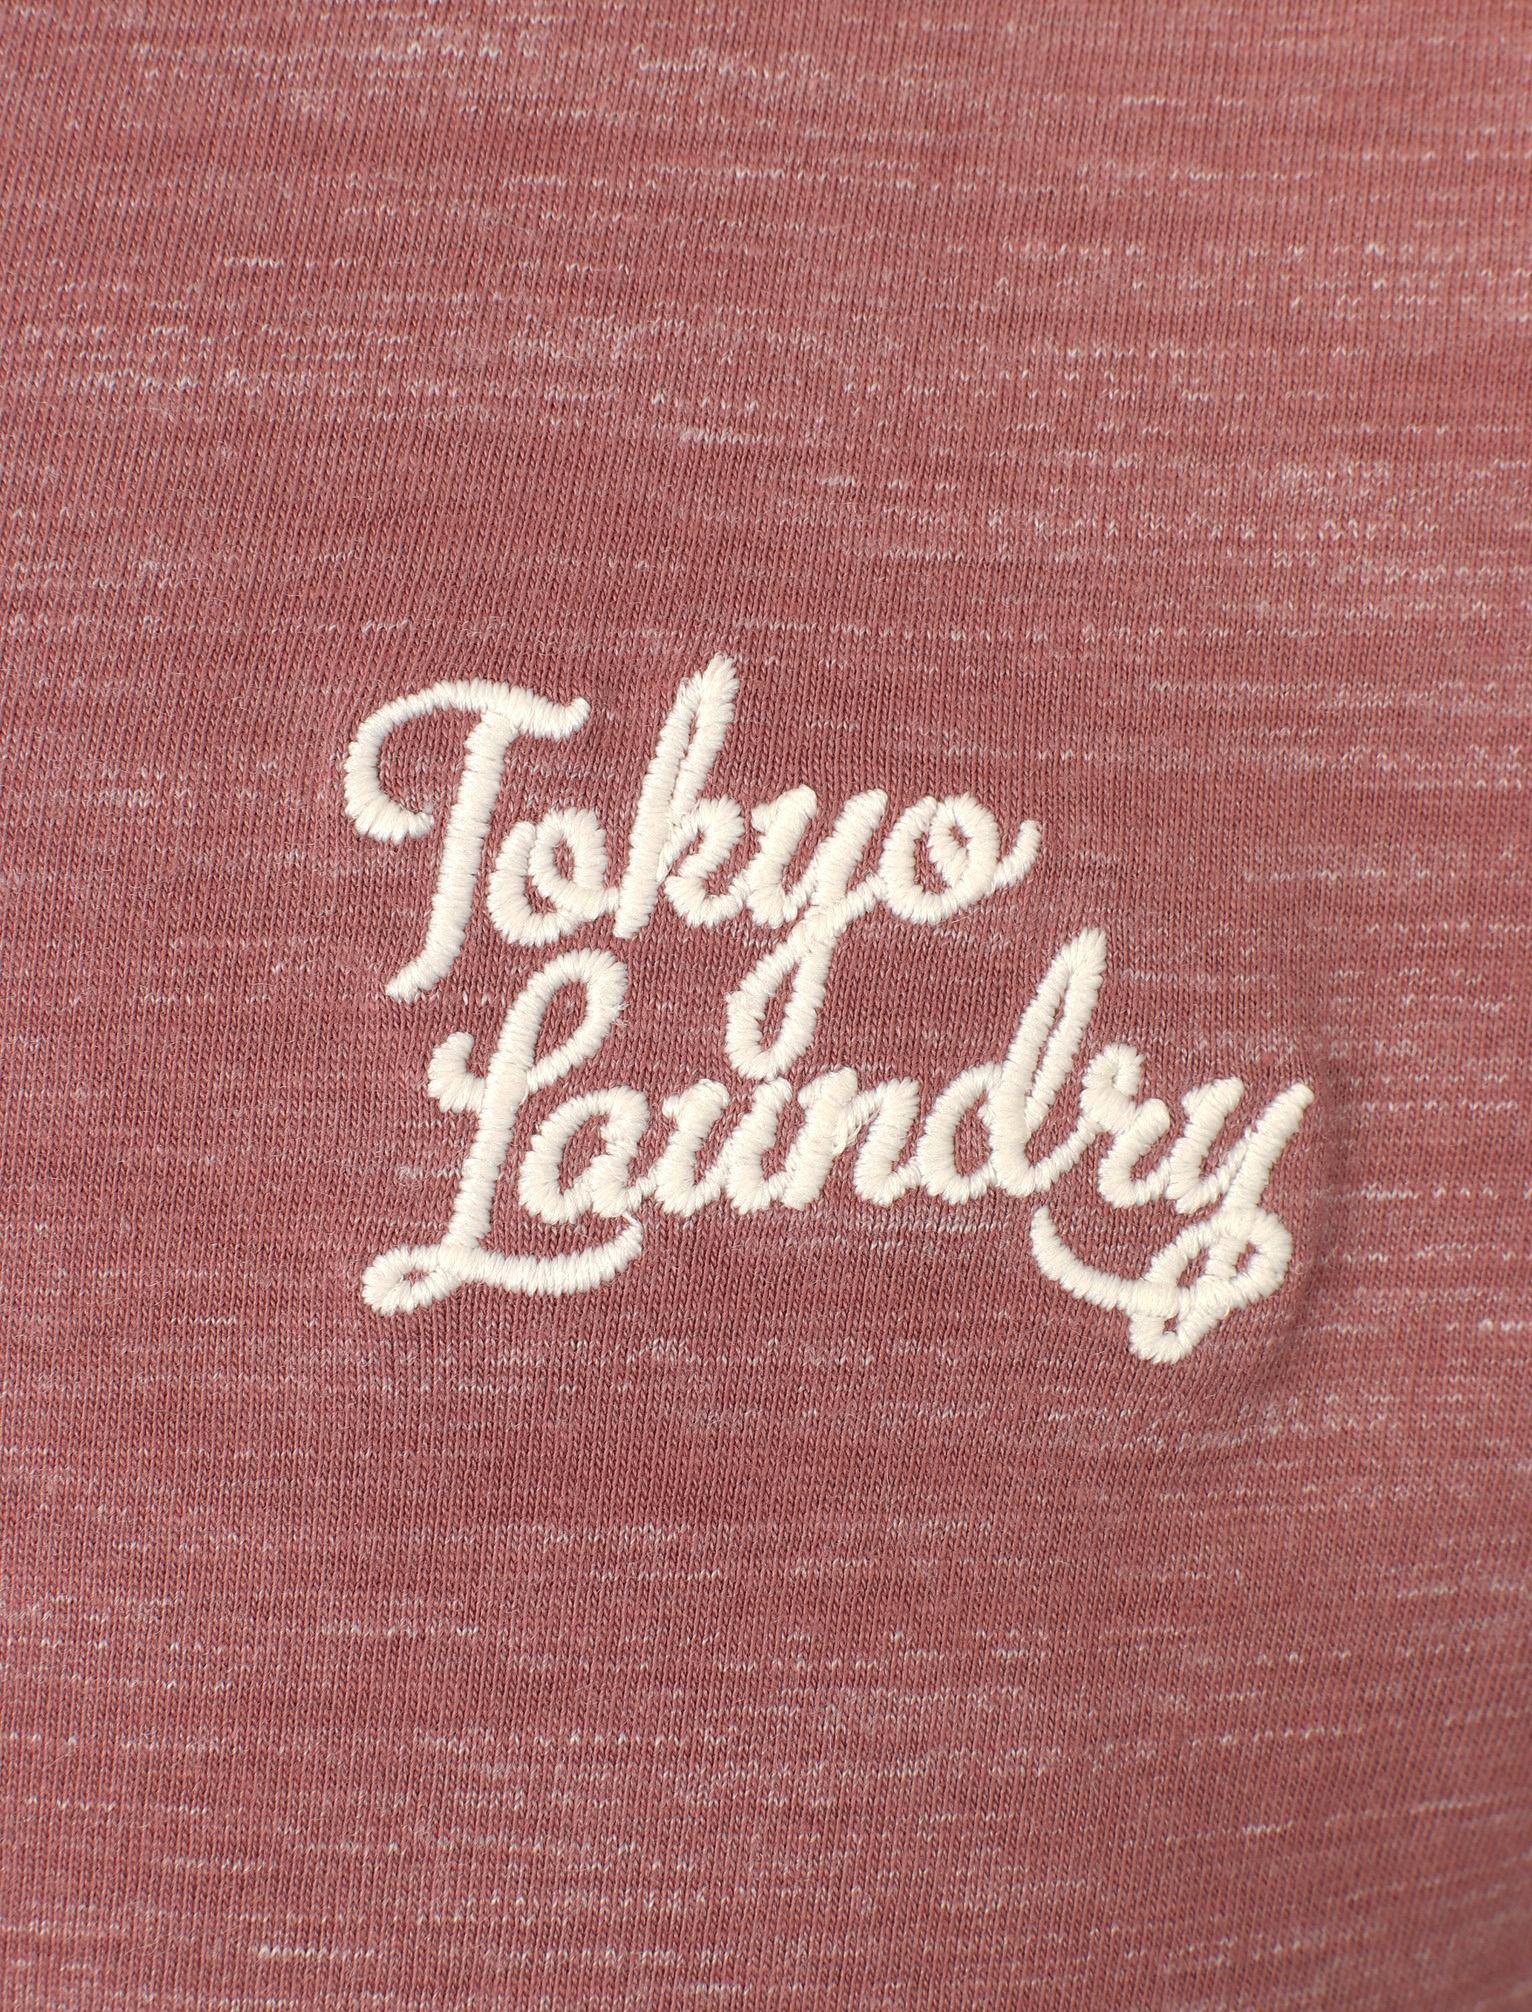 New Mens Tokyo Laundry Sun Lake Ribbed Crew Neck Cotton Blend T-Shirt Size S-XXL